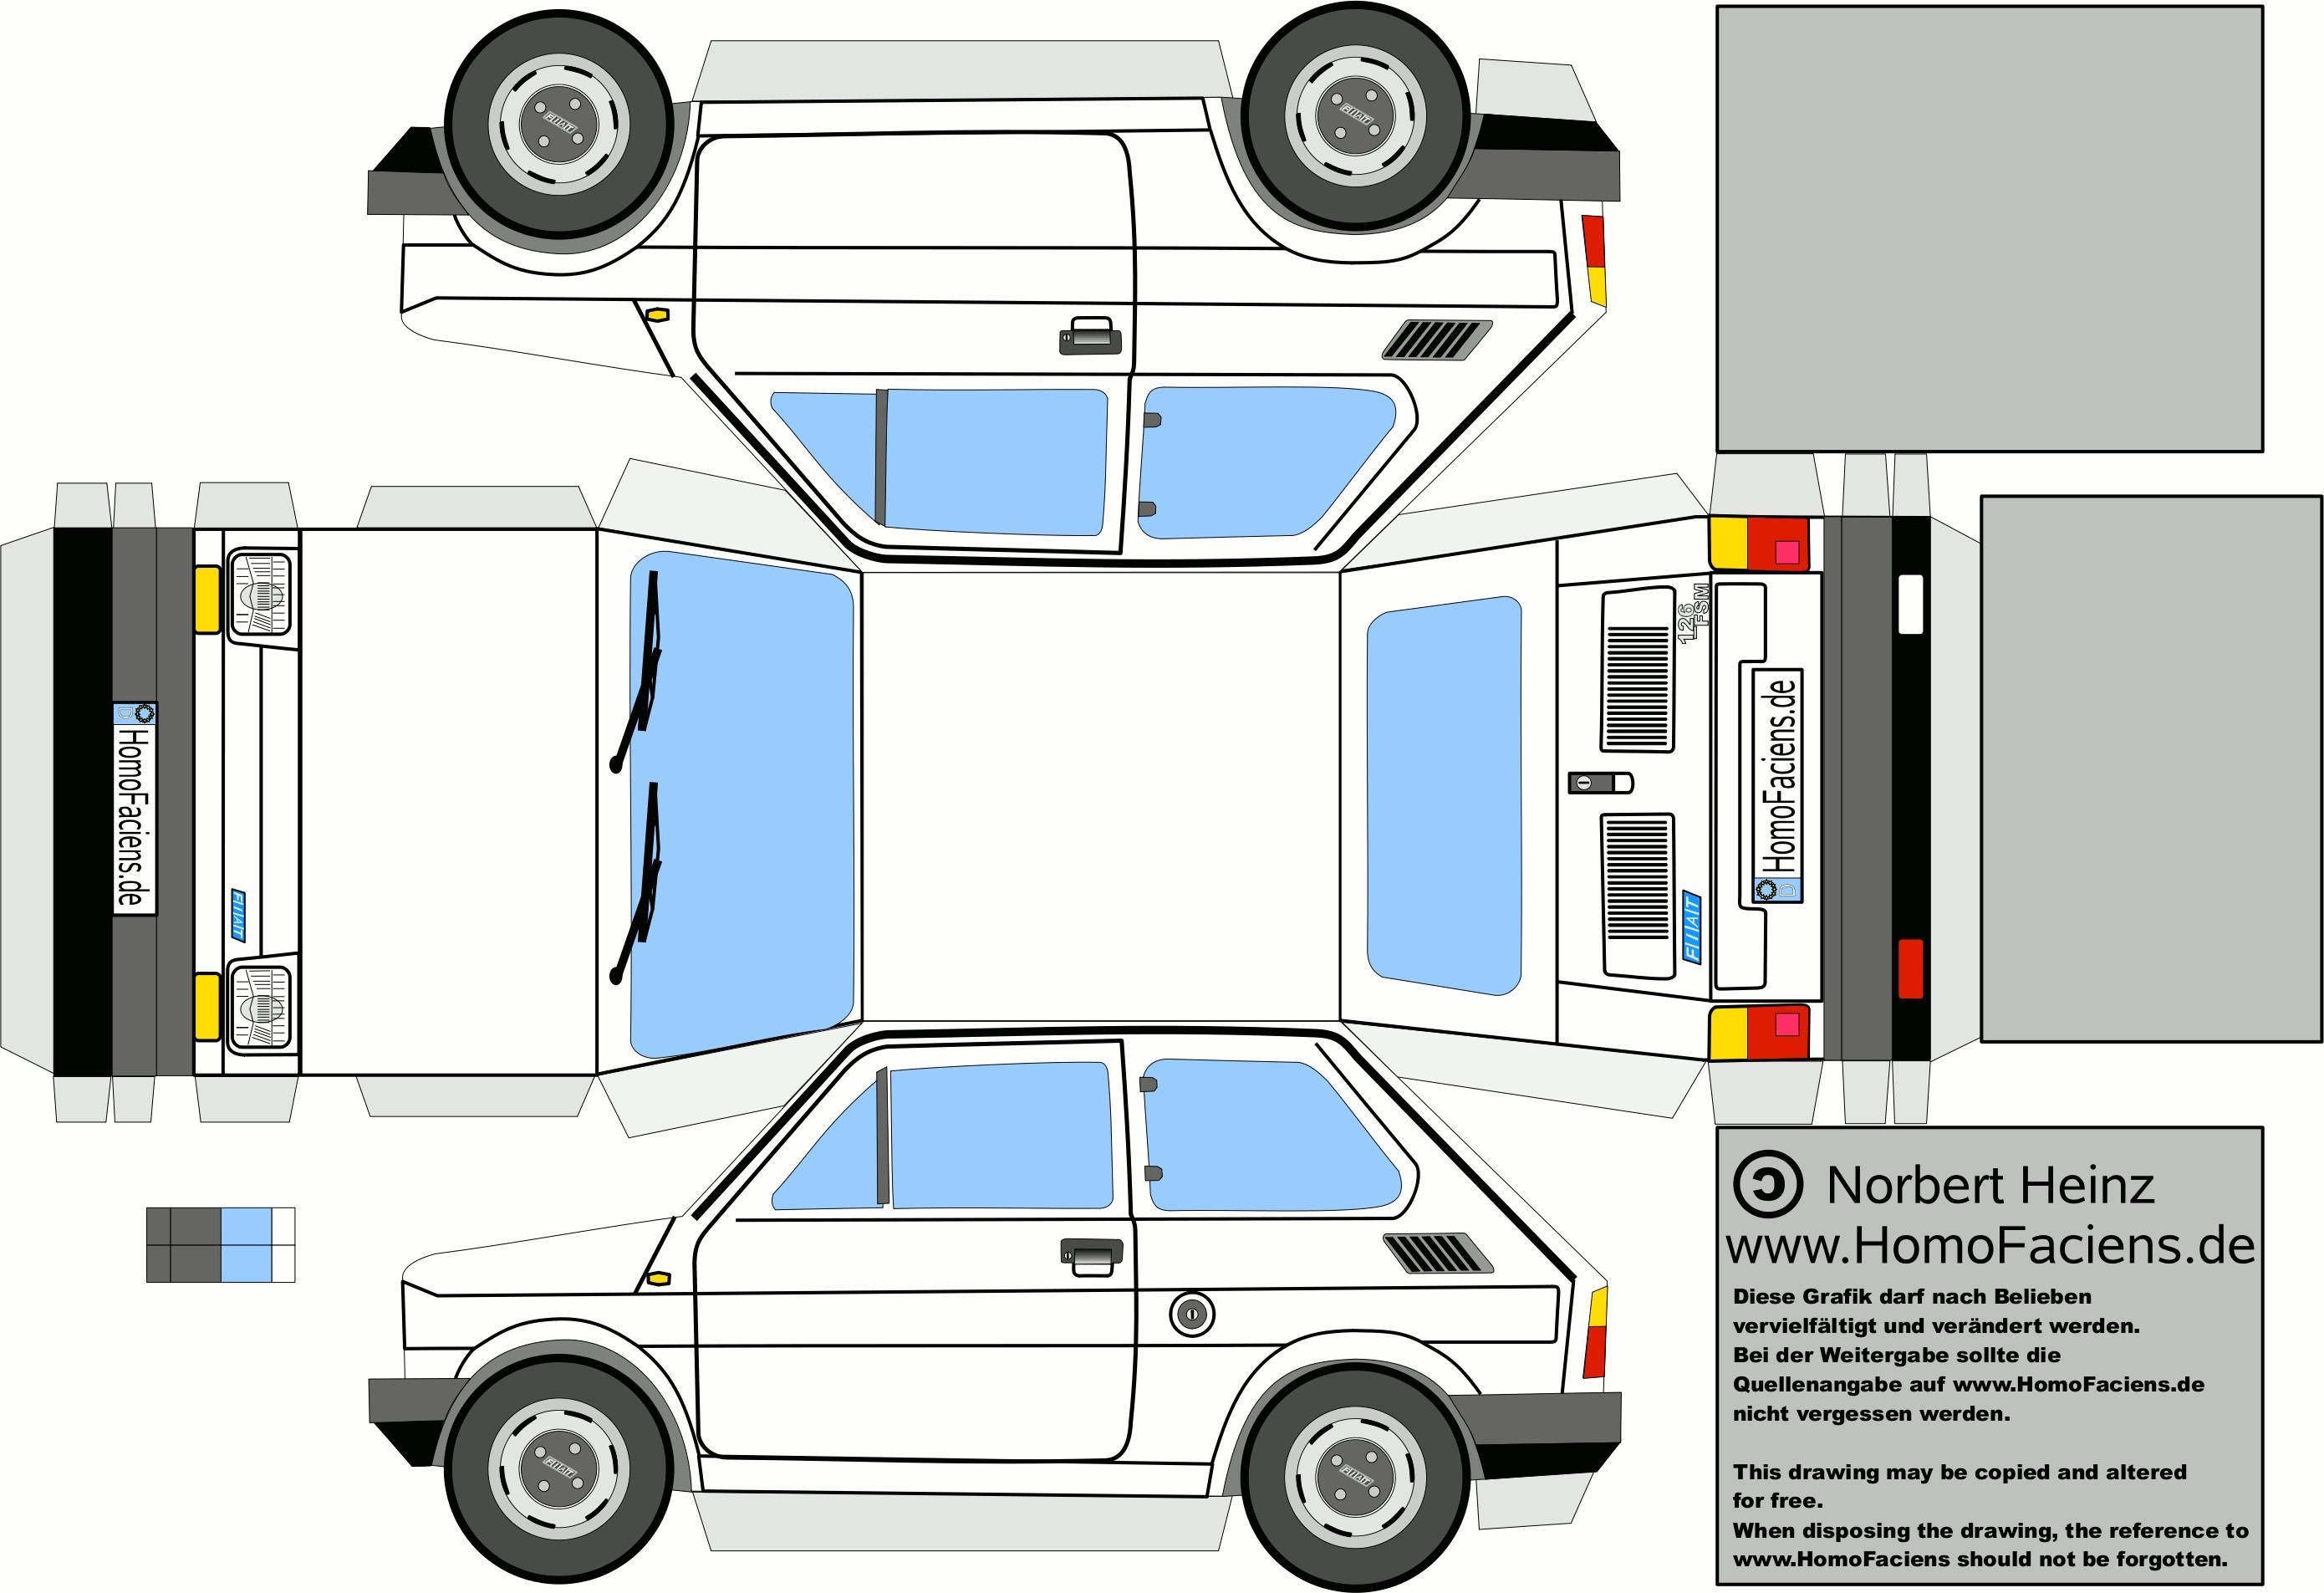 Motorcycle Papercraft Fiat 126 Papercraft Homofaciens Downloads